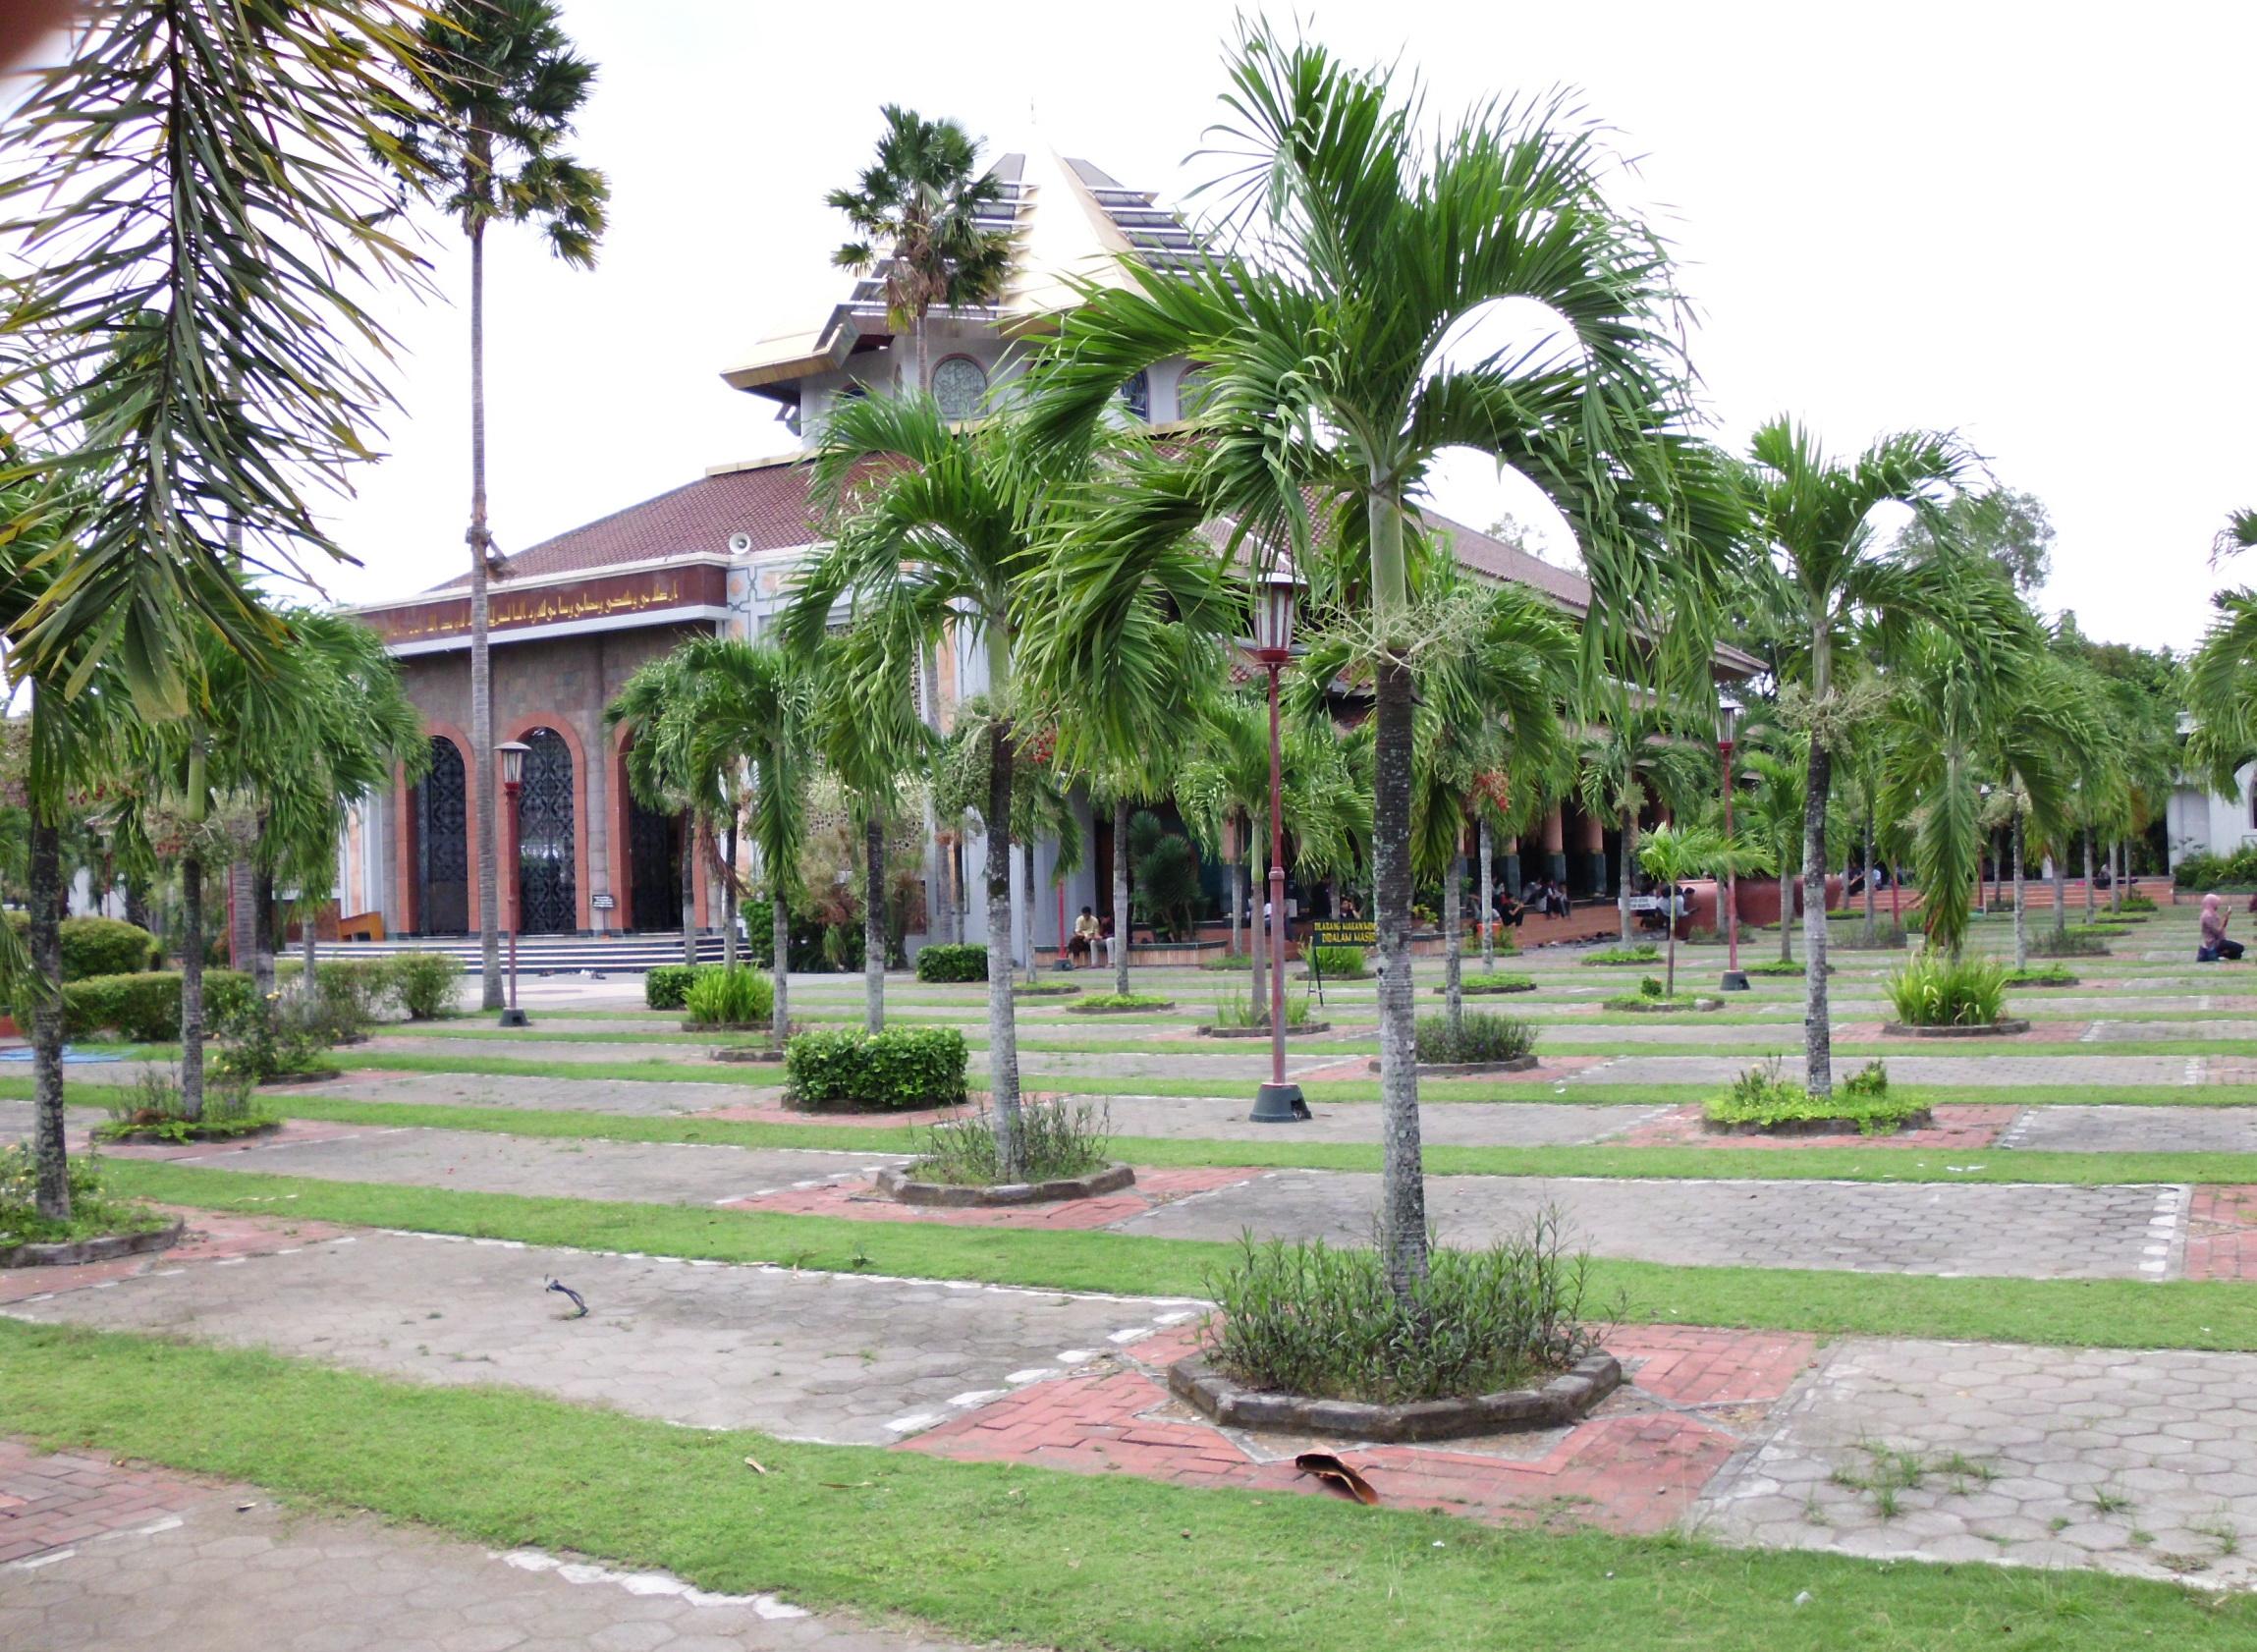 Sekilas Tentang Masjid Kampus Ugm Muslim Yogyakarta Halaman Maskam Kab